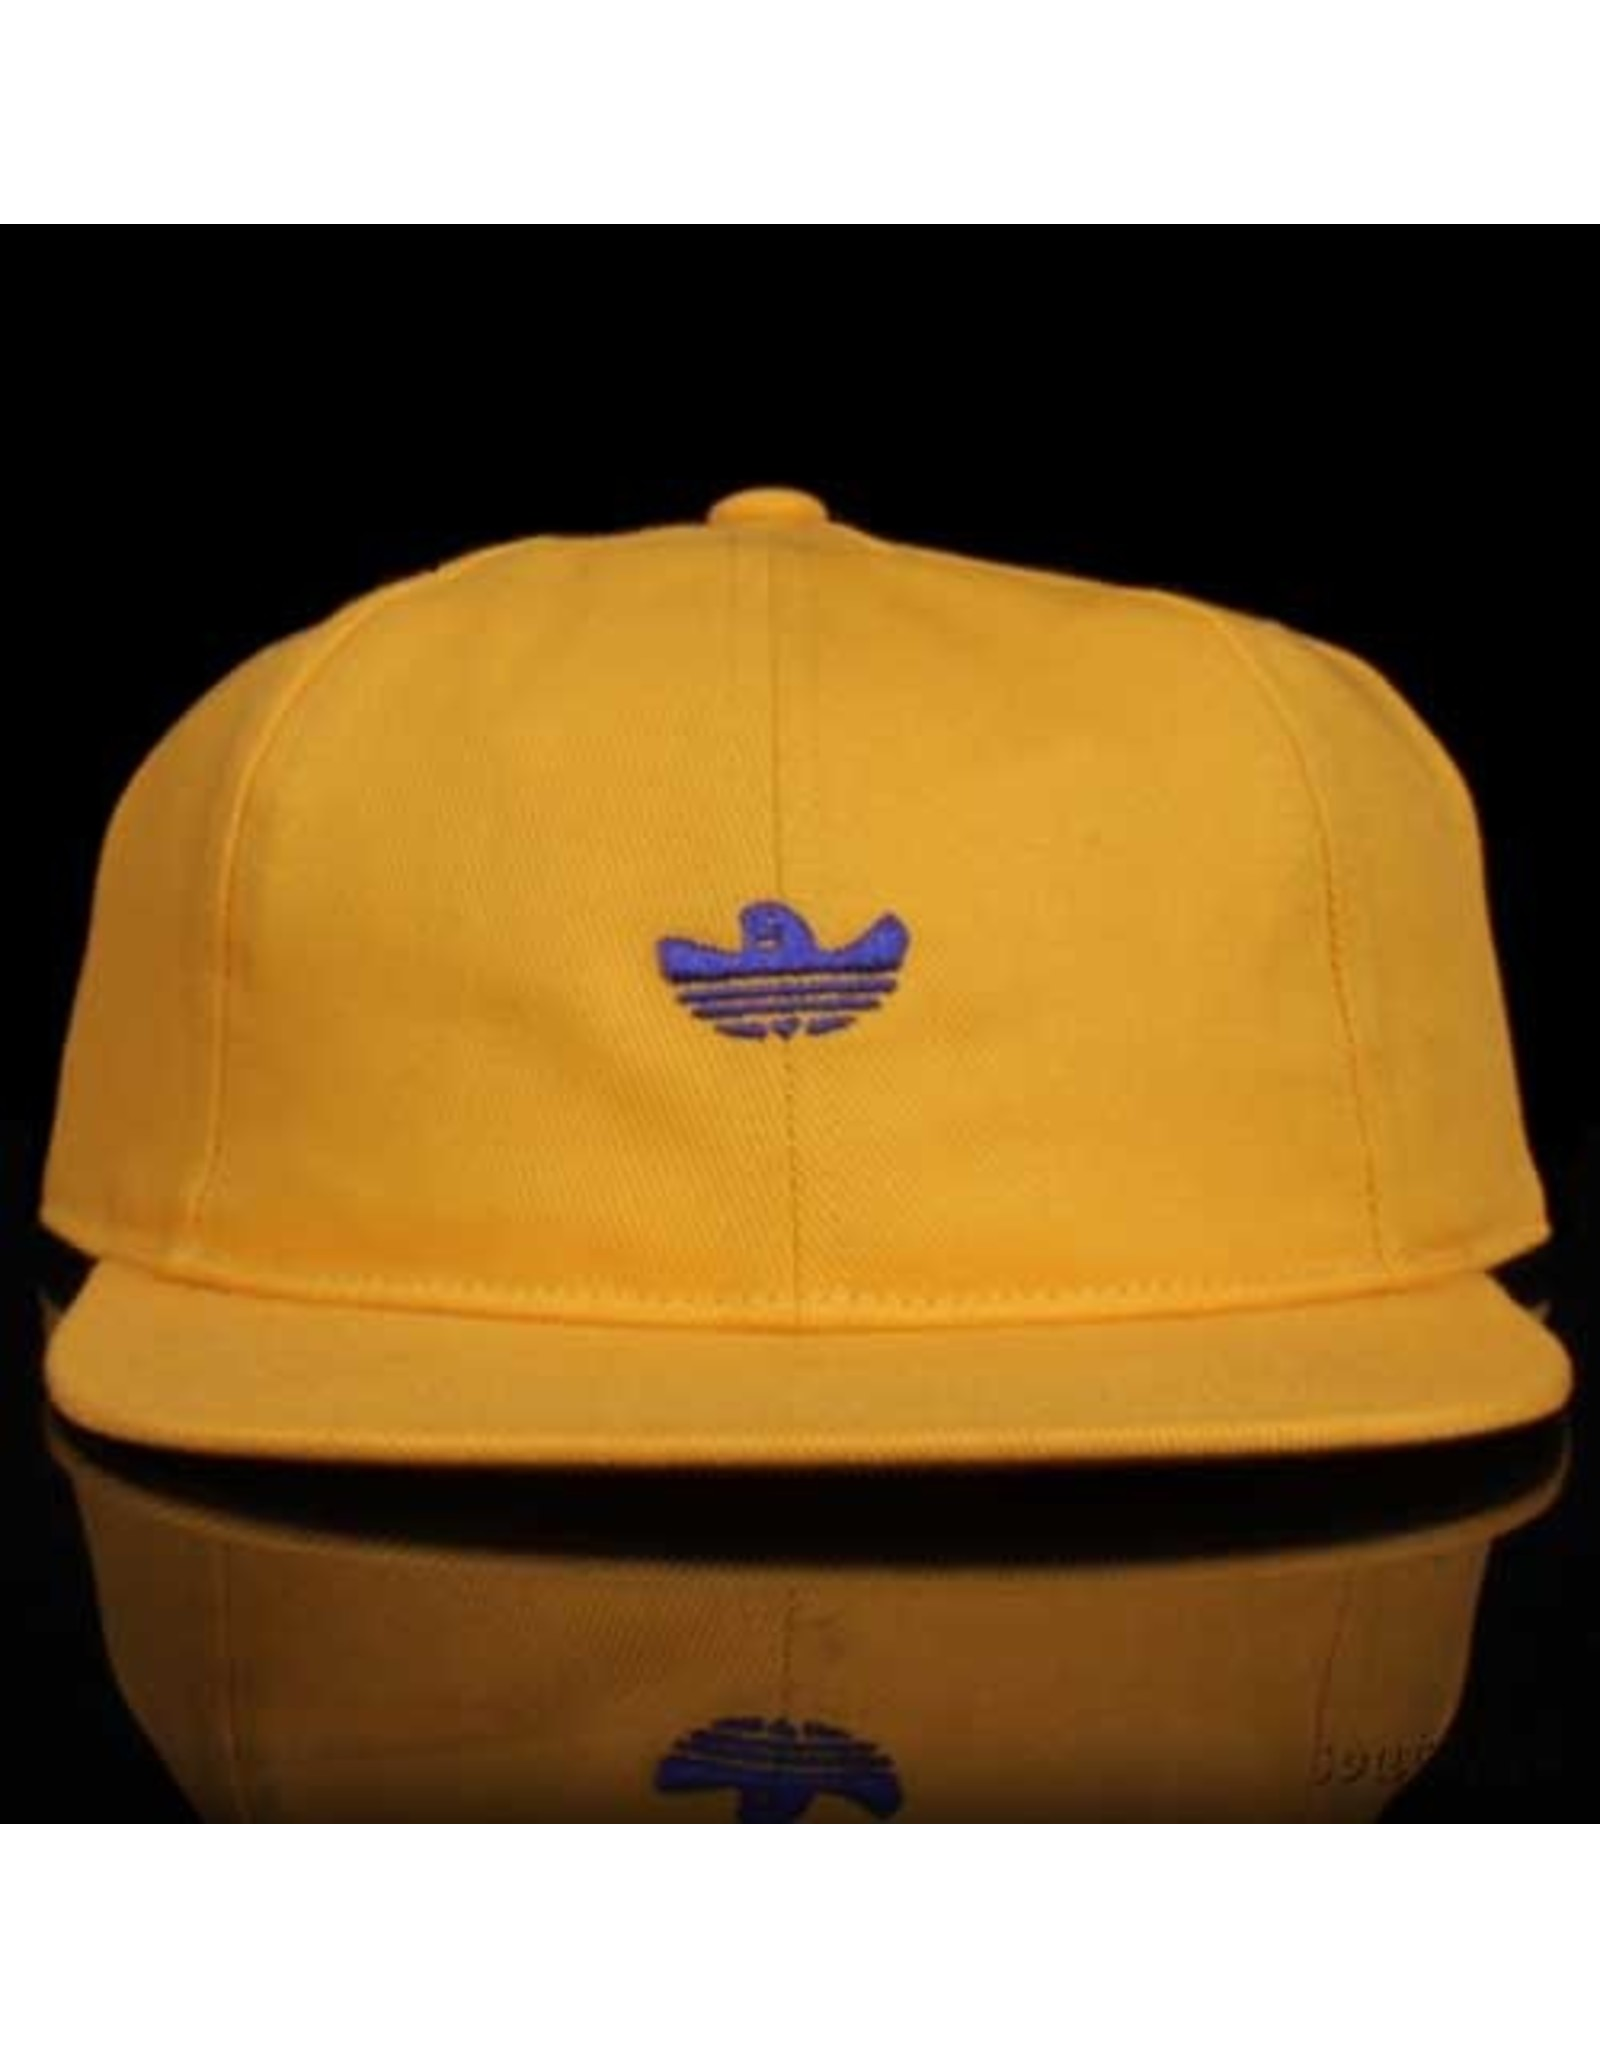 ADIDAS Adidas Hat Shmoo 6 Panel Strapback Yellow Blue Embroidery